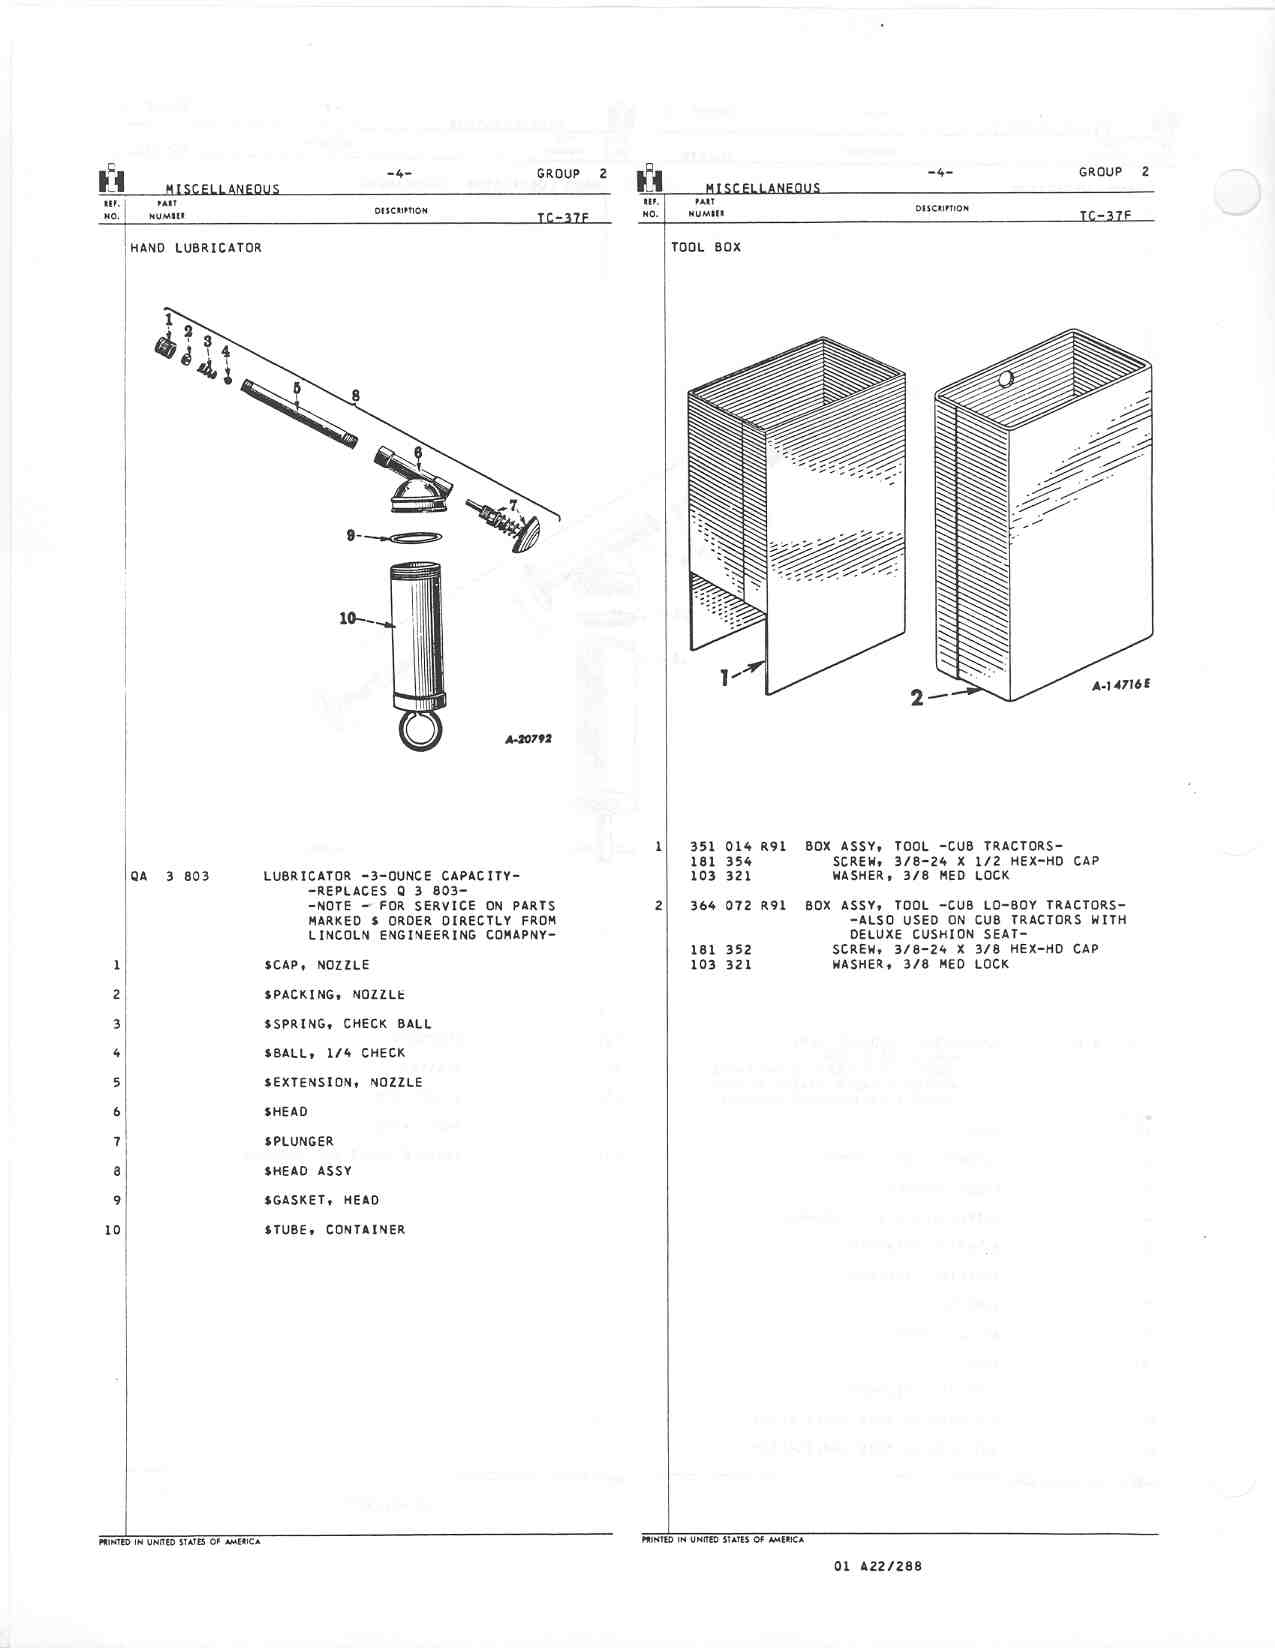 Rock Restoration Project Page 25 Farmall Cub 1952 Wiring Diagram Http Farmallcubinfo Manuals 002 04